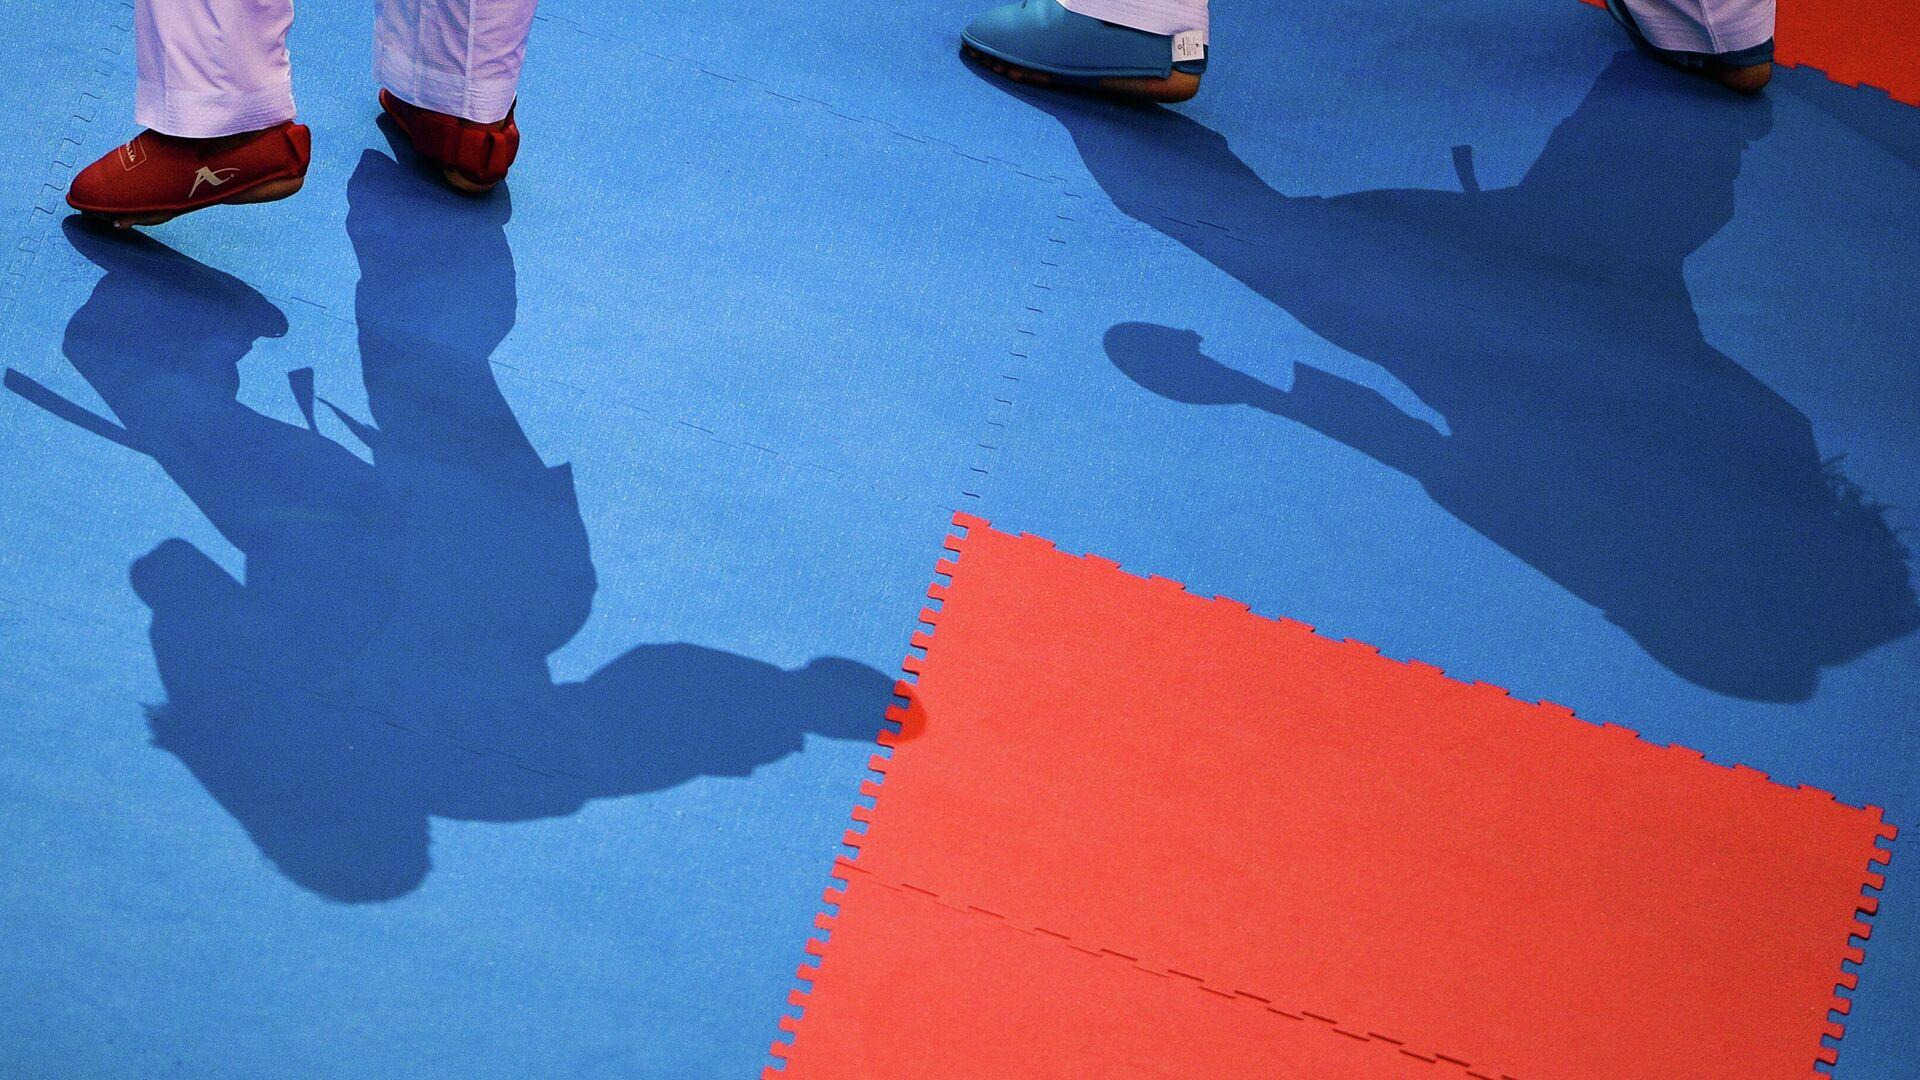 Тени на татами во время поединка соревнований по каратэ  - РИА Новости, 1920, 13.06.2021